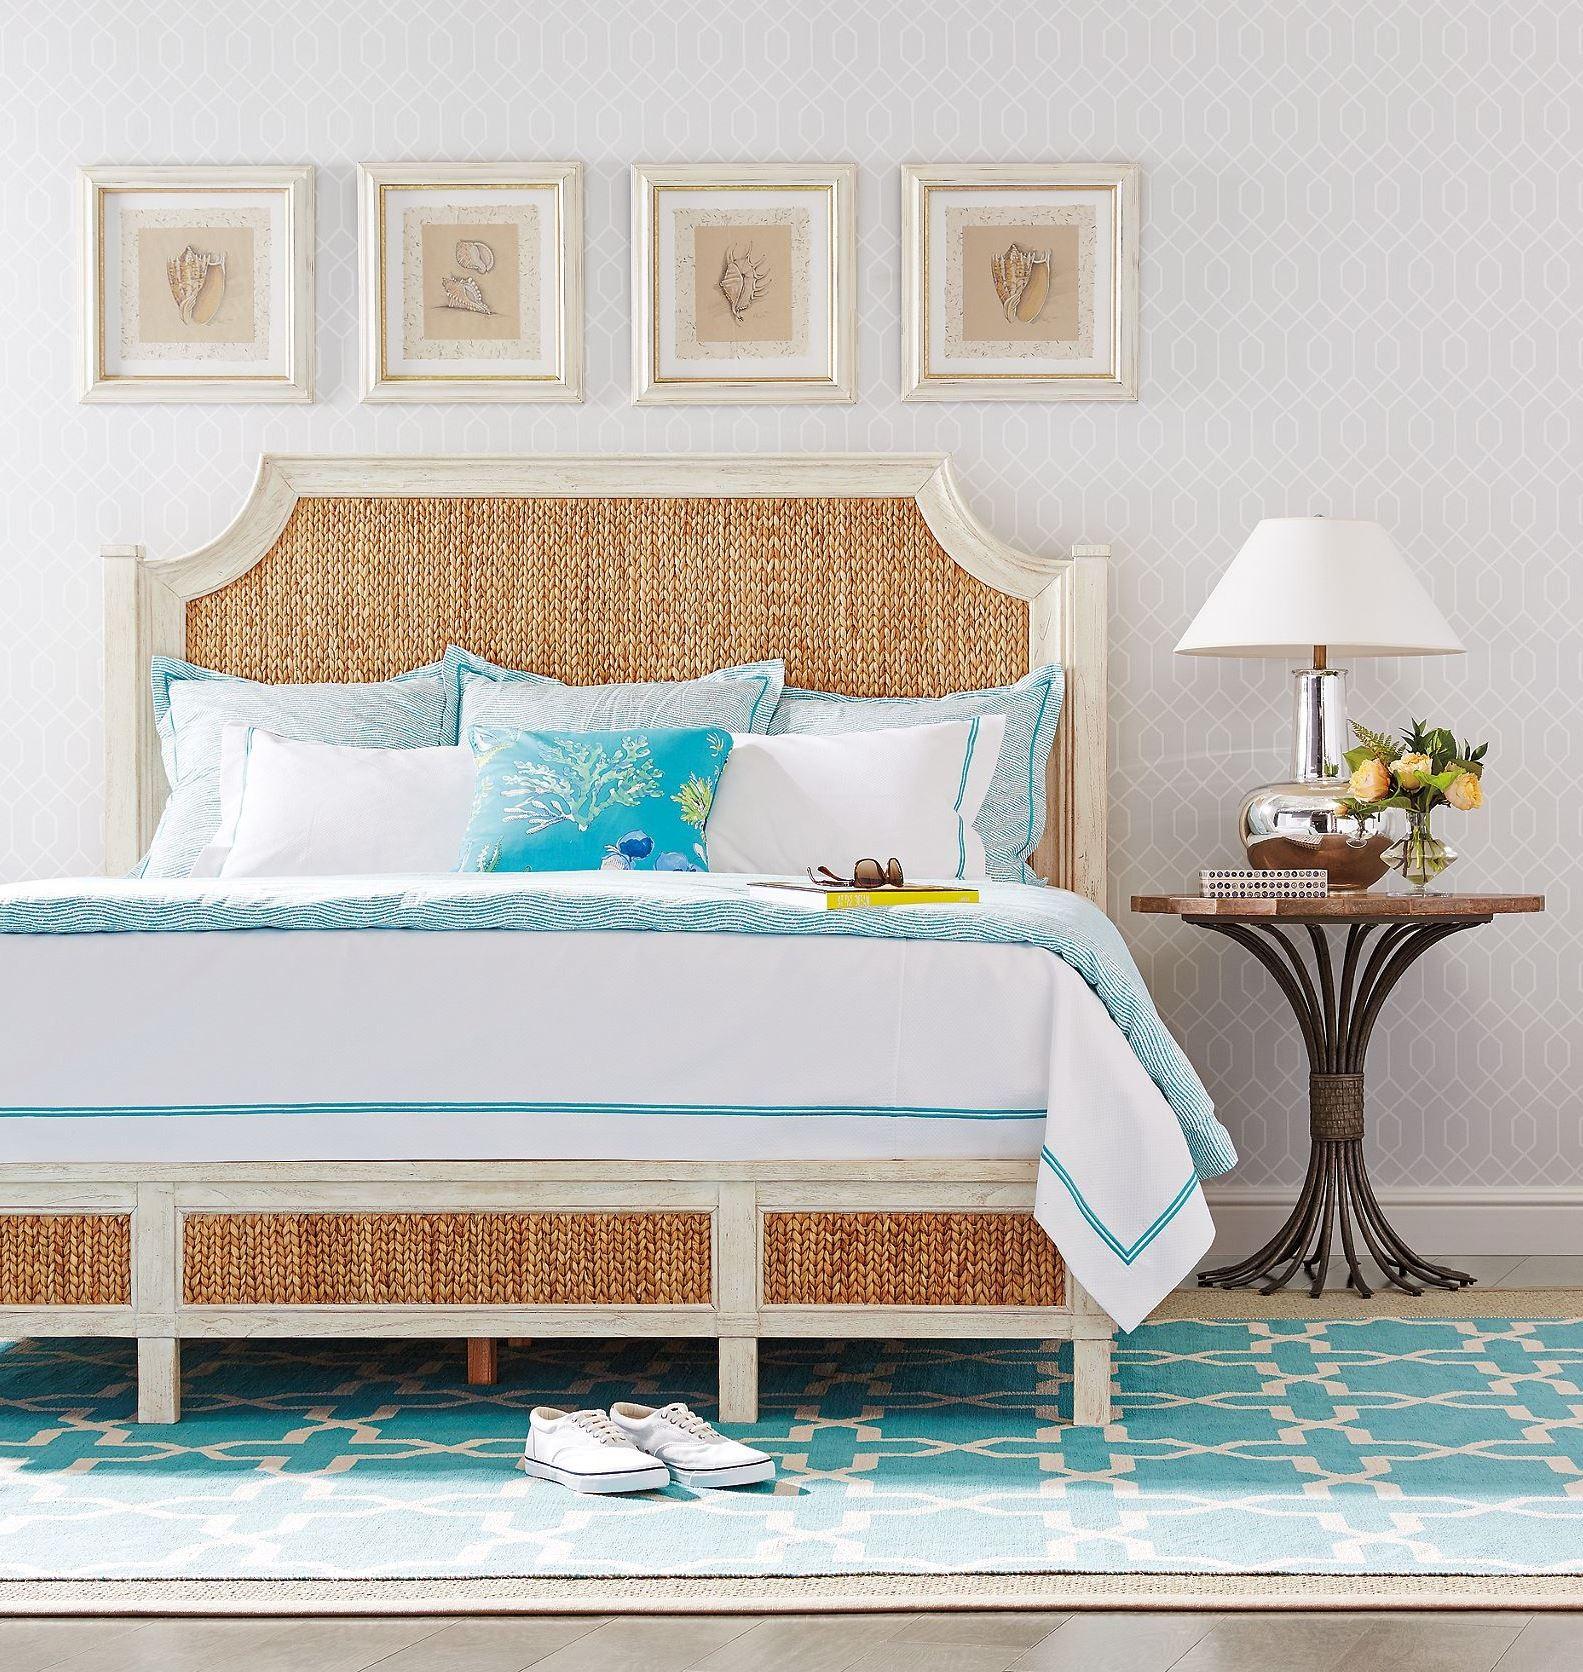 Meadow Bedroom Set Coastal Living Resort Sailcloth Water Meadow Woven Bedroom